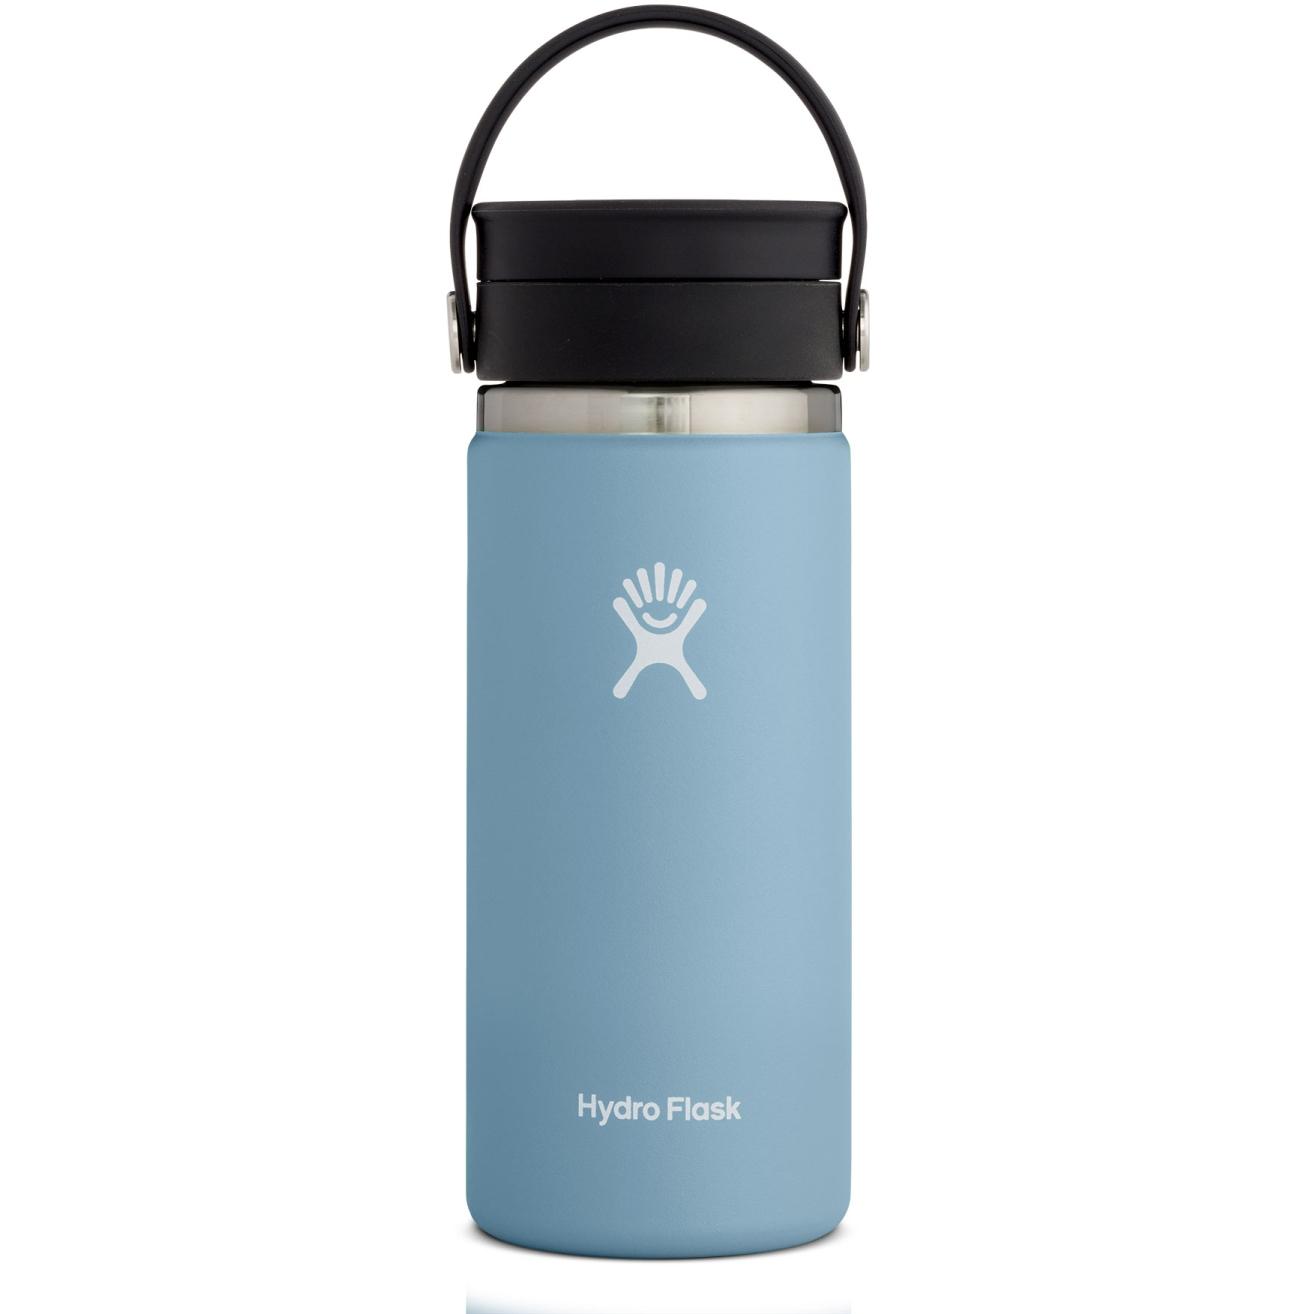 Hydro Flask 16oz Coffee mit Flex Sip™ Lid Thermoflasche - 473ml - Rain